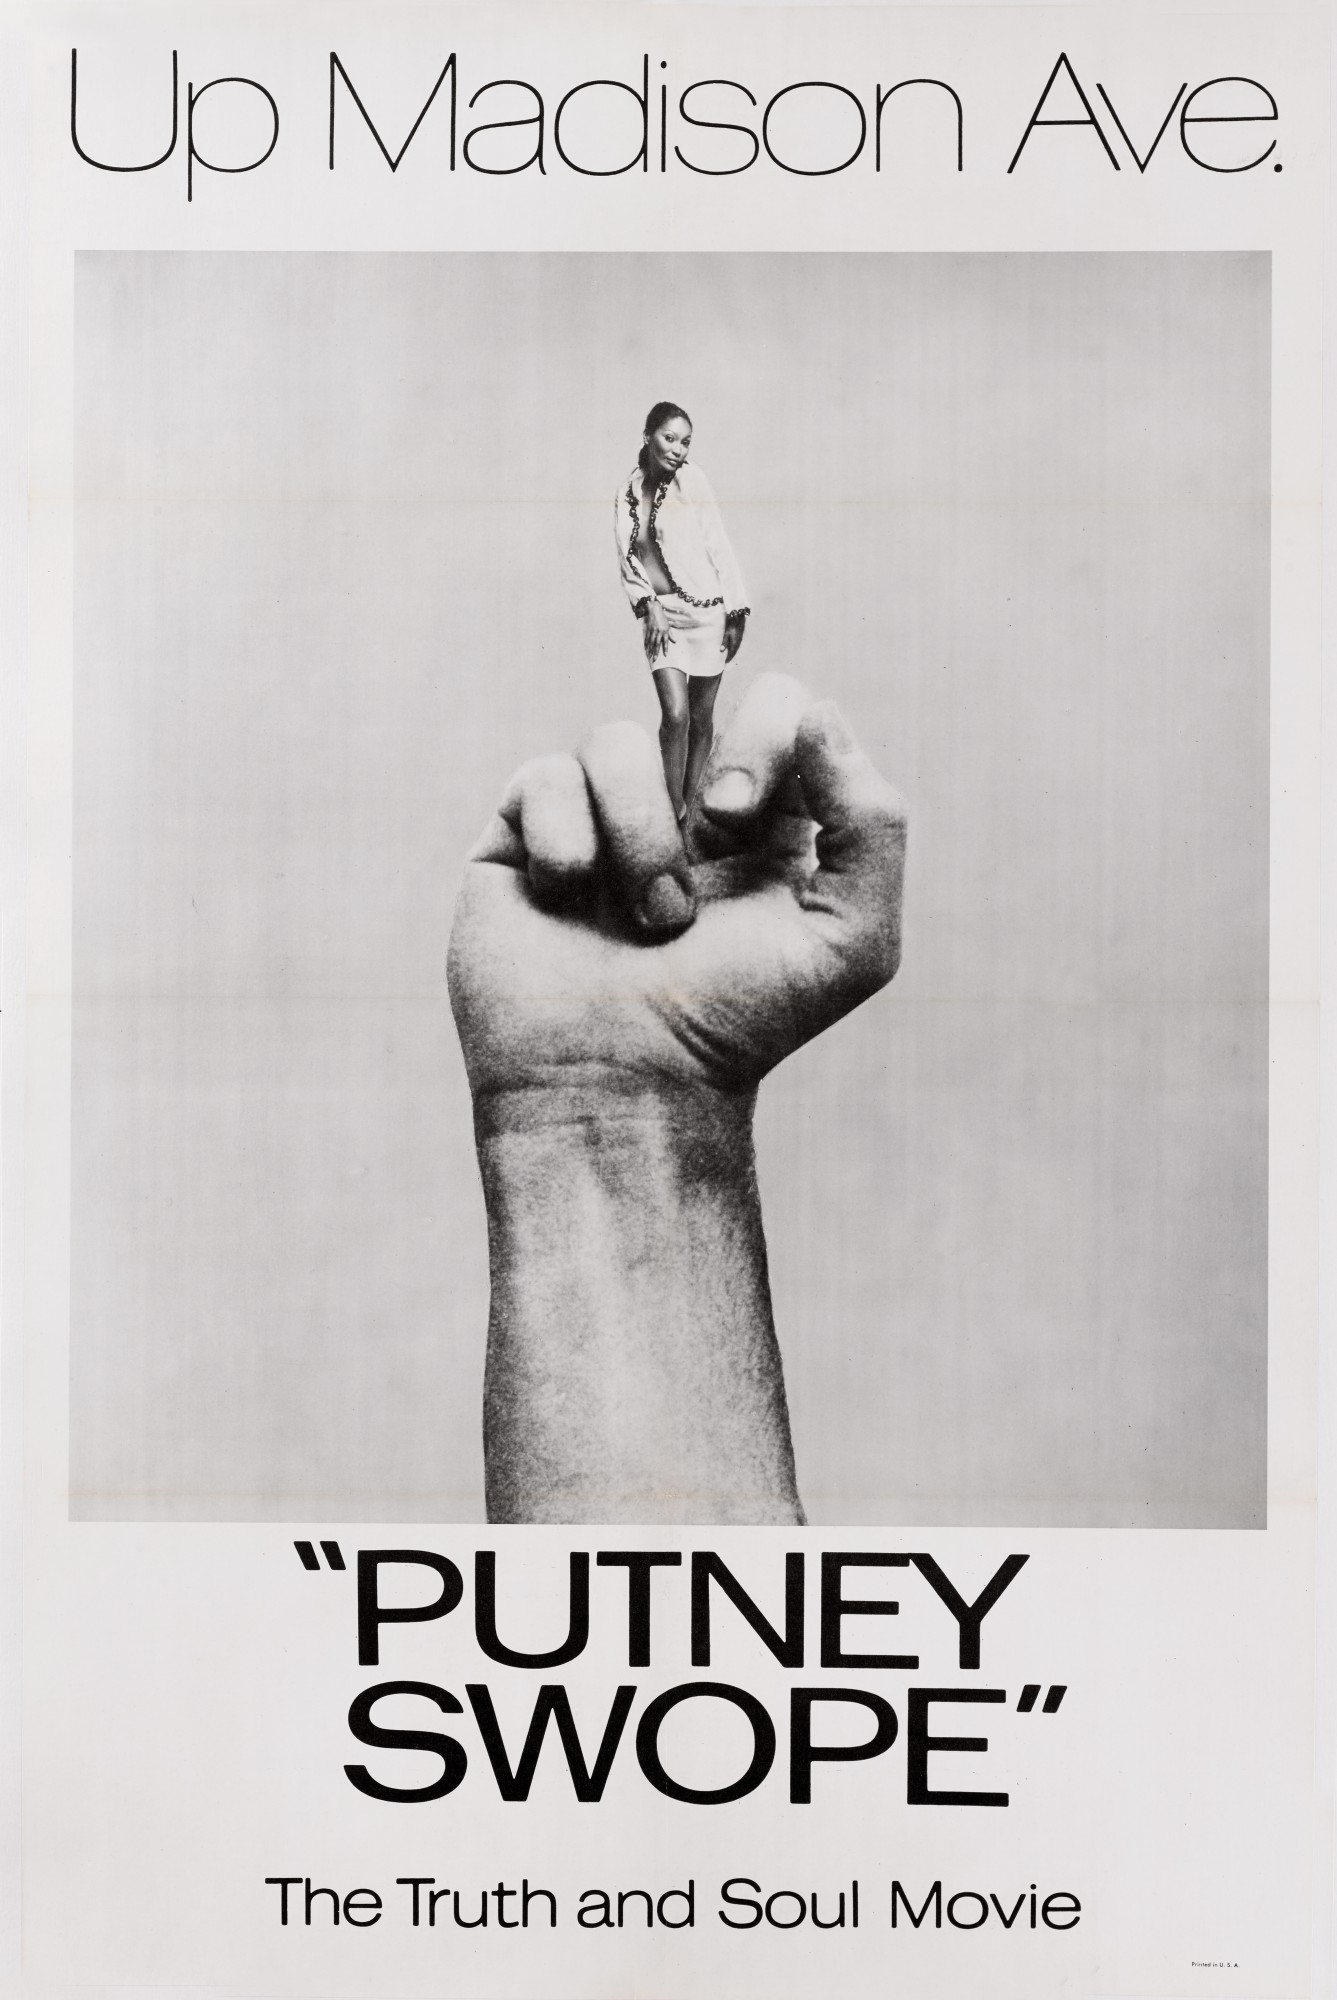 PUTNEY SWOPE (1969) POSTER, US